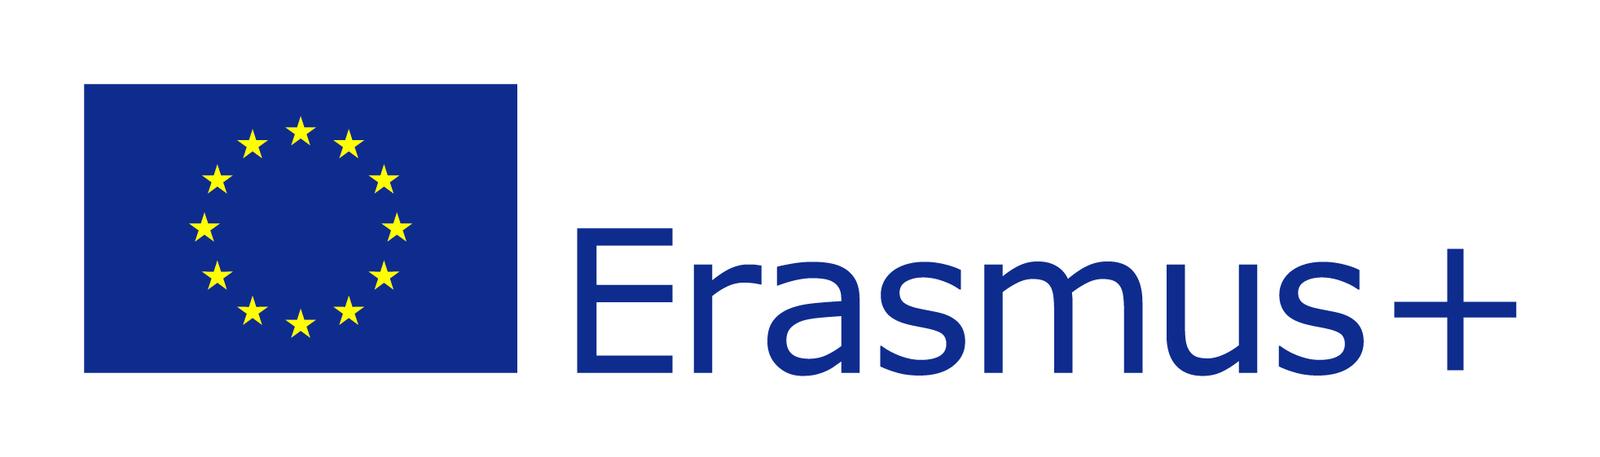 eu_flag-erasmus_vect_pos.jpg